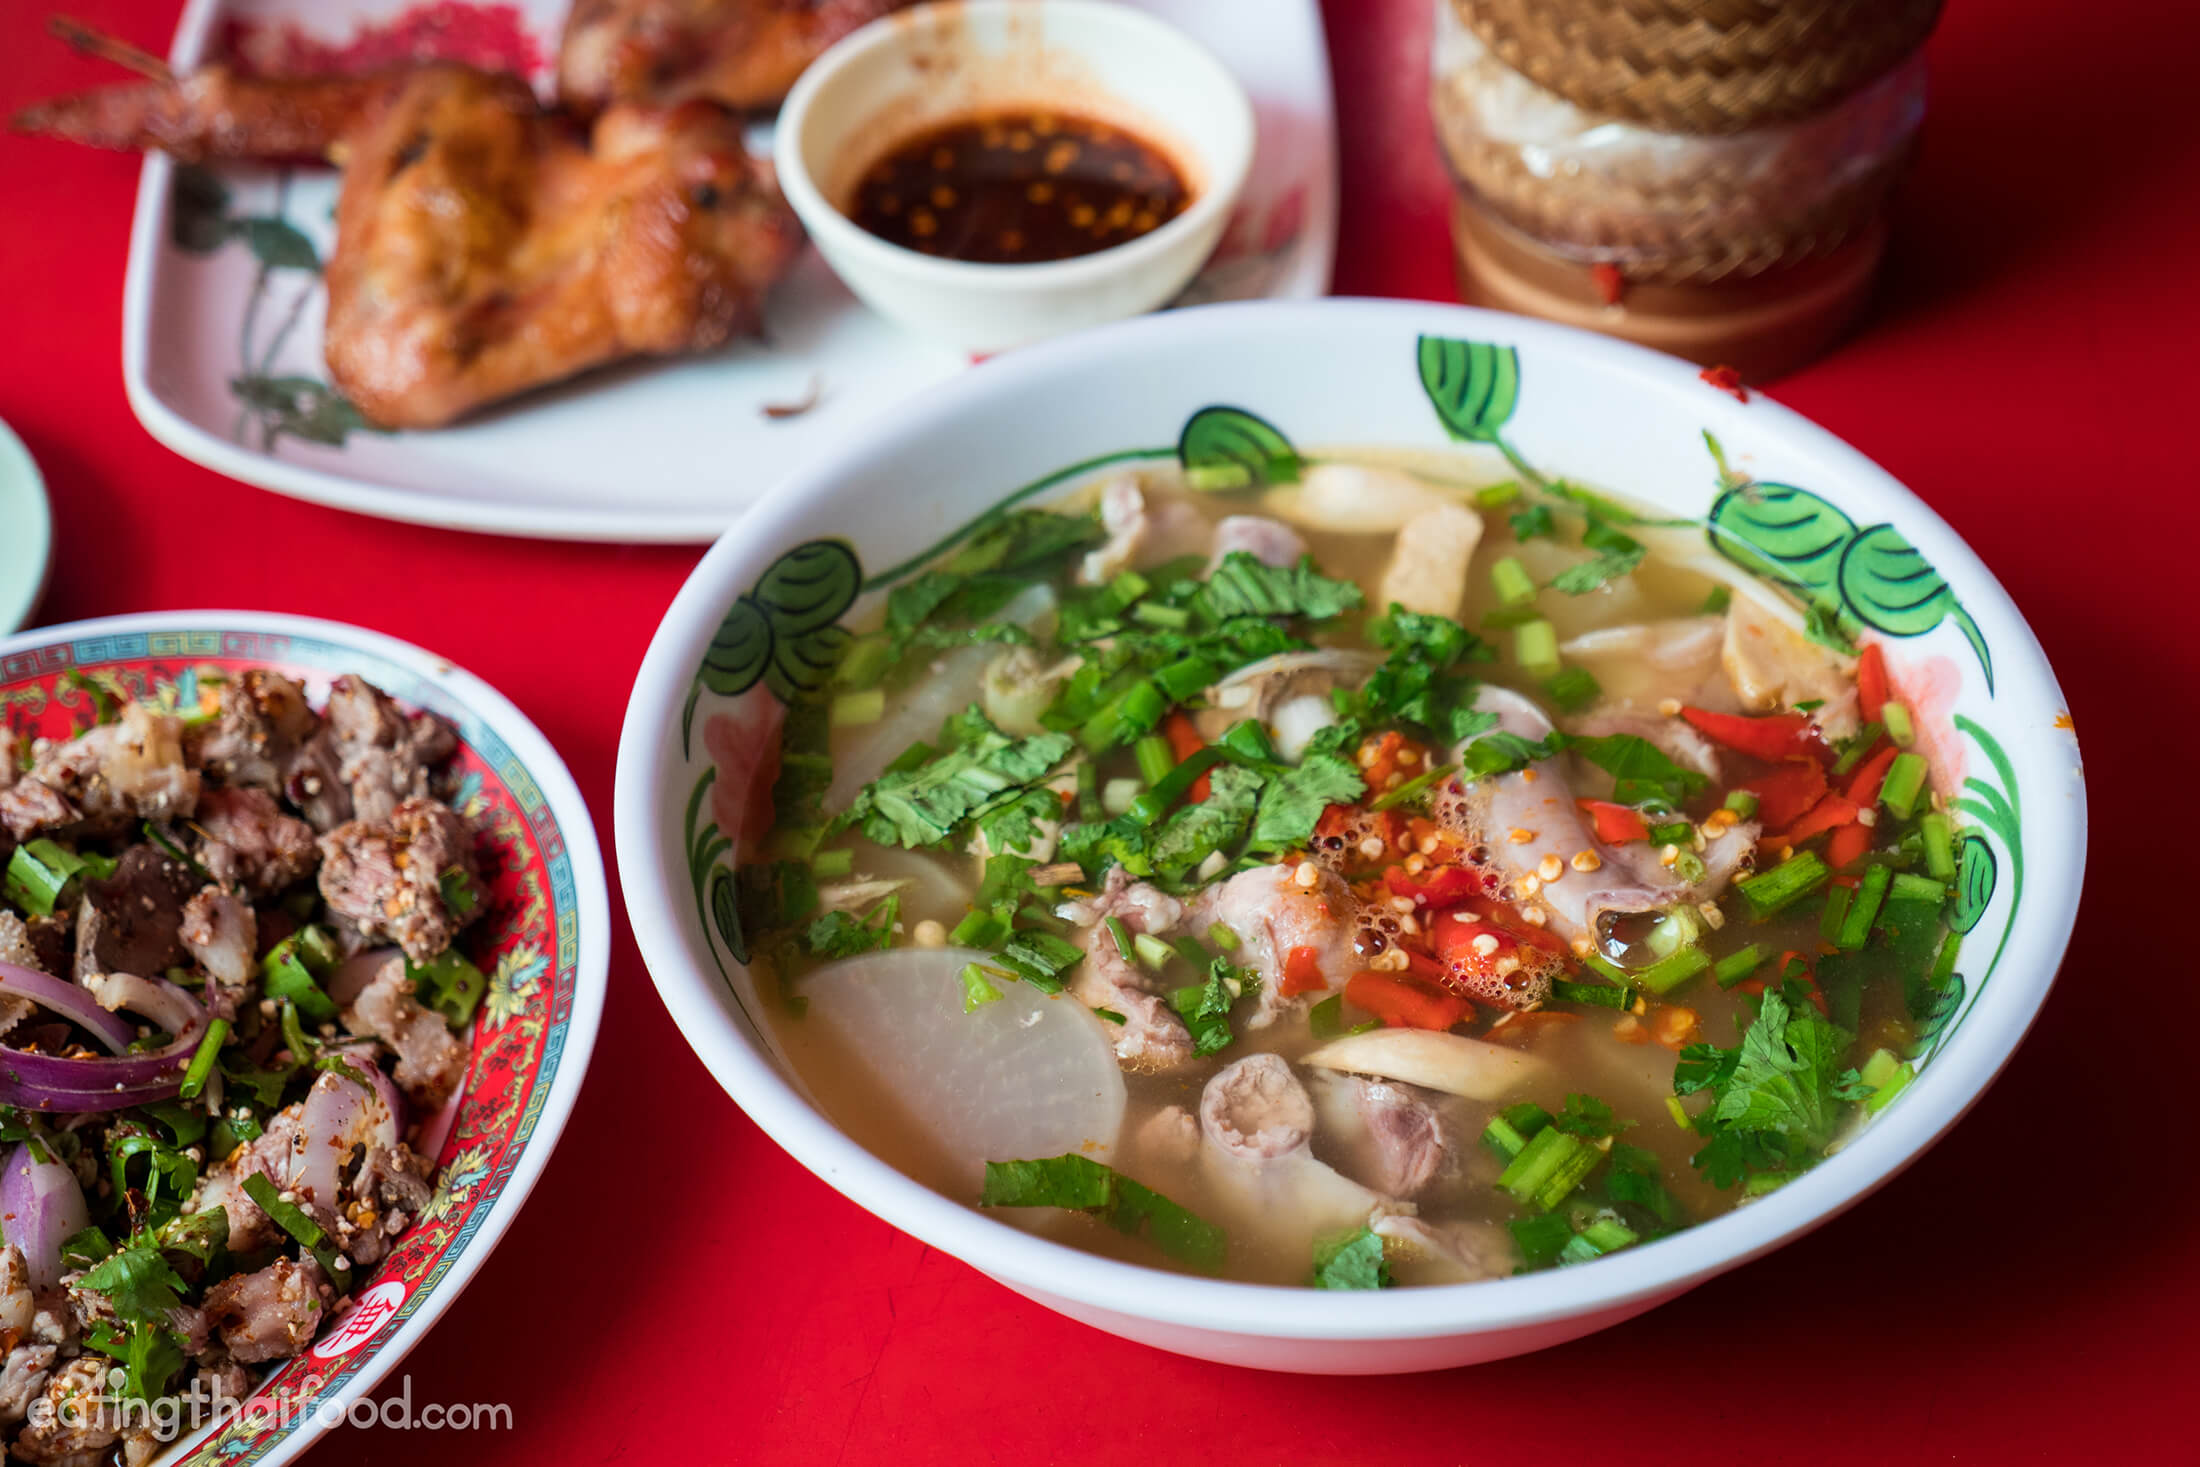 Real-Deal Isaan Food in Bangkok at Som Tam Jay So (ร้านส้มตำเจ๊โส)